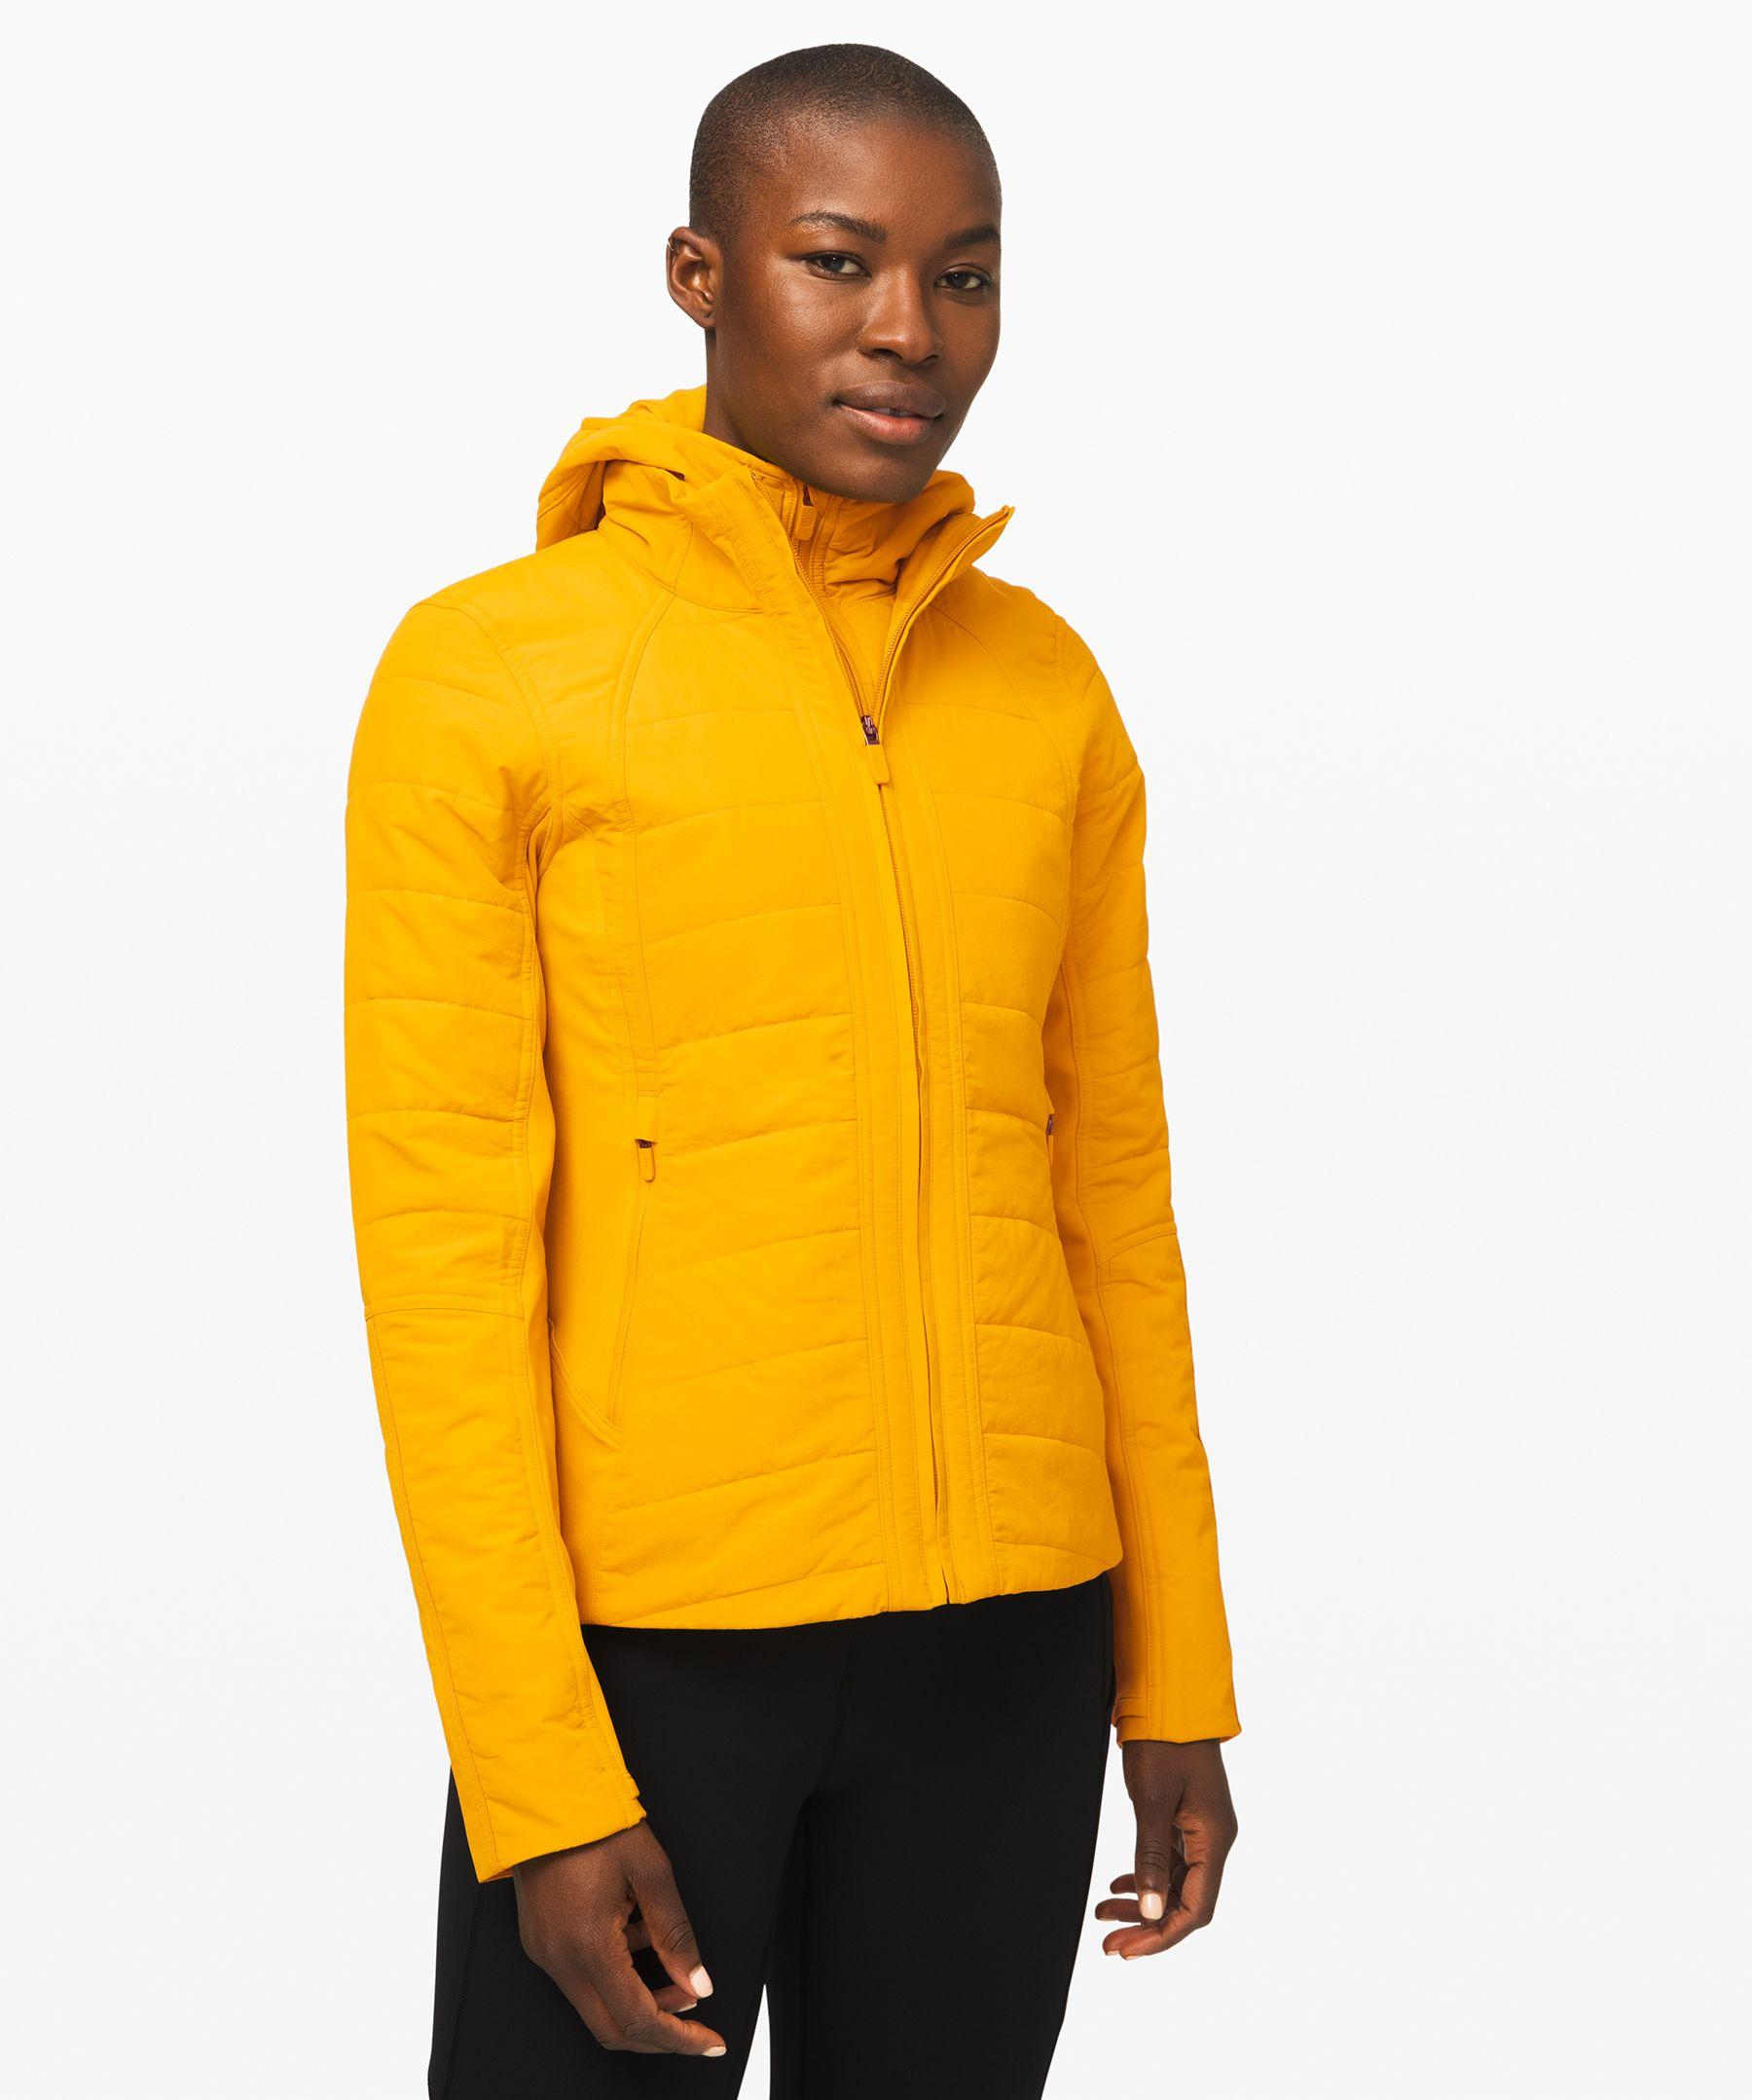 Lululemon Another Mile Jacket In Honeycomb